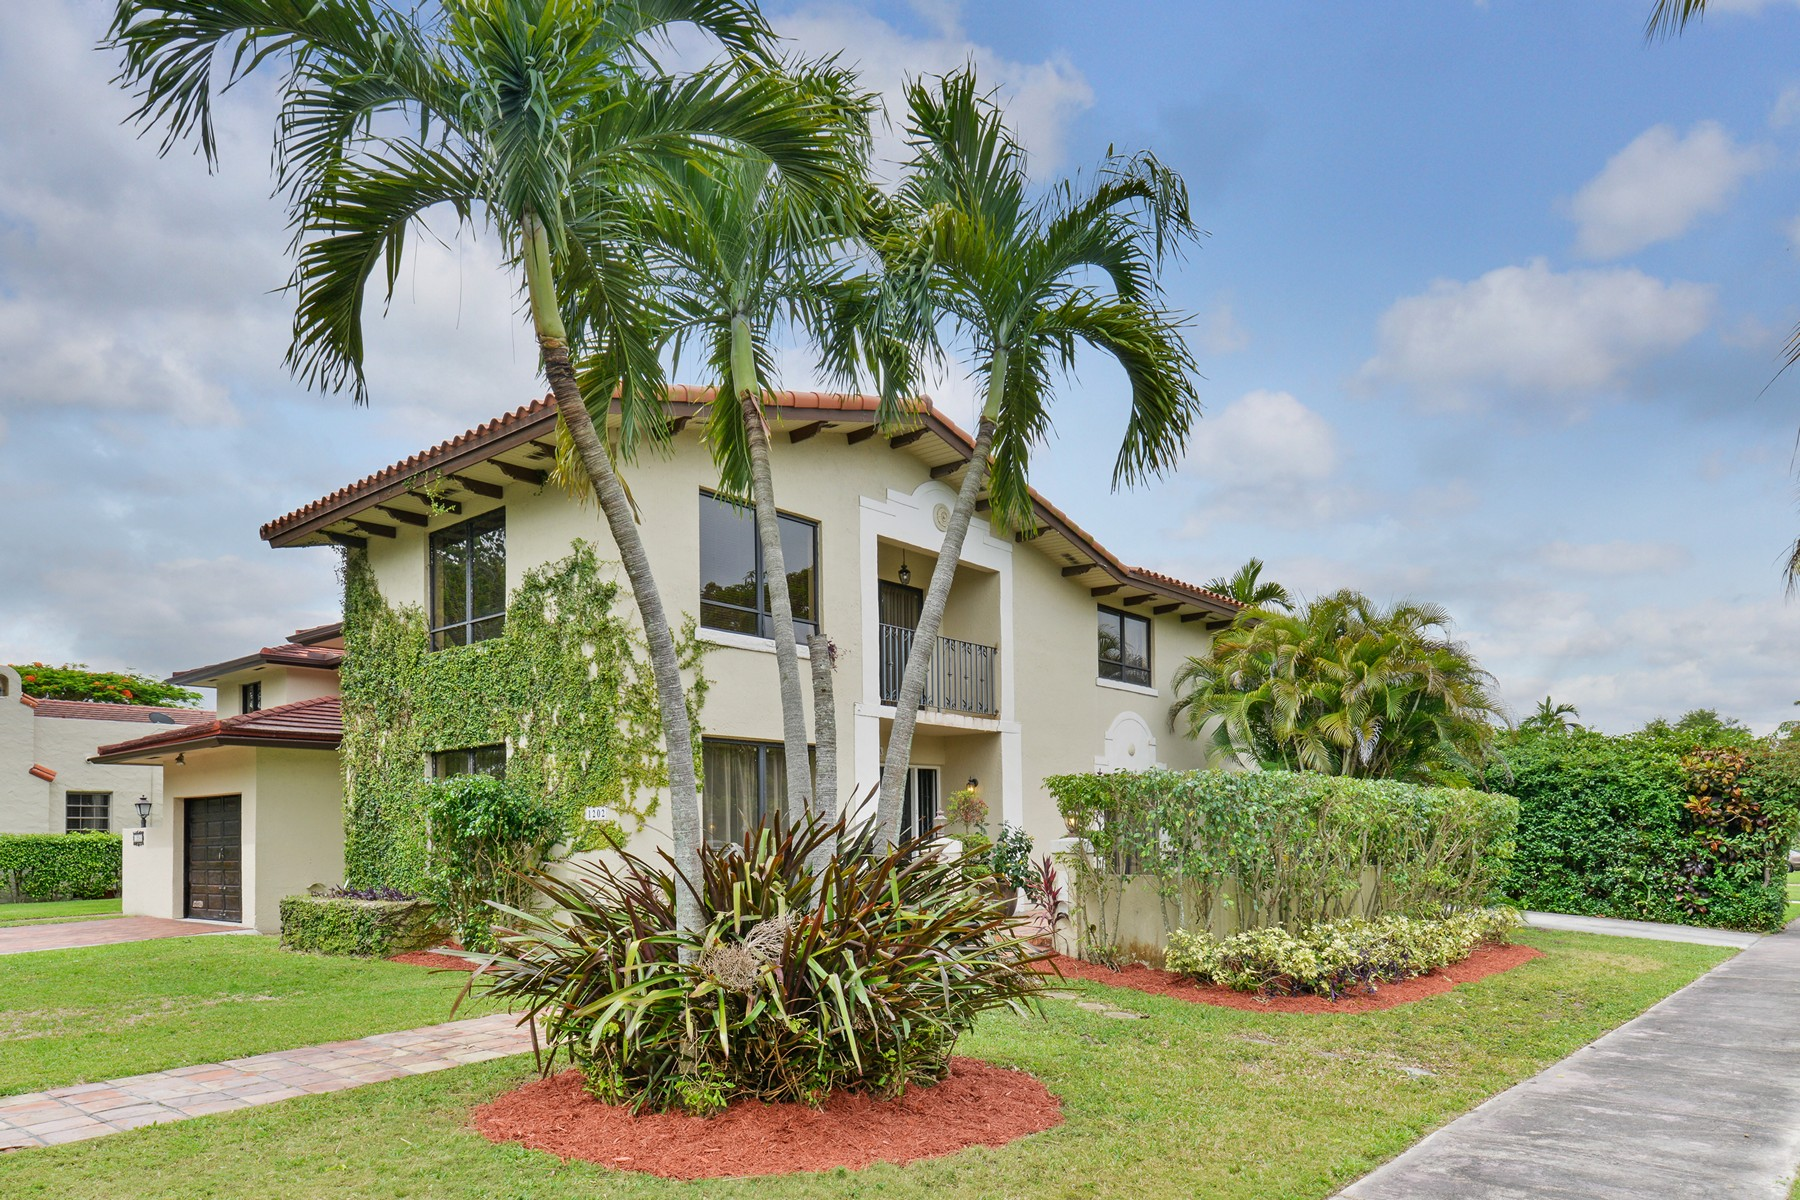 Casa para uma família para Venda às 1202 Columbus Blvd Coral Gables, Florida 33134 Estados Unidos